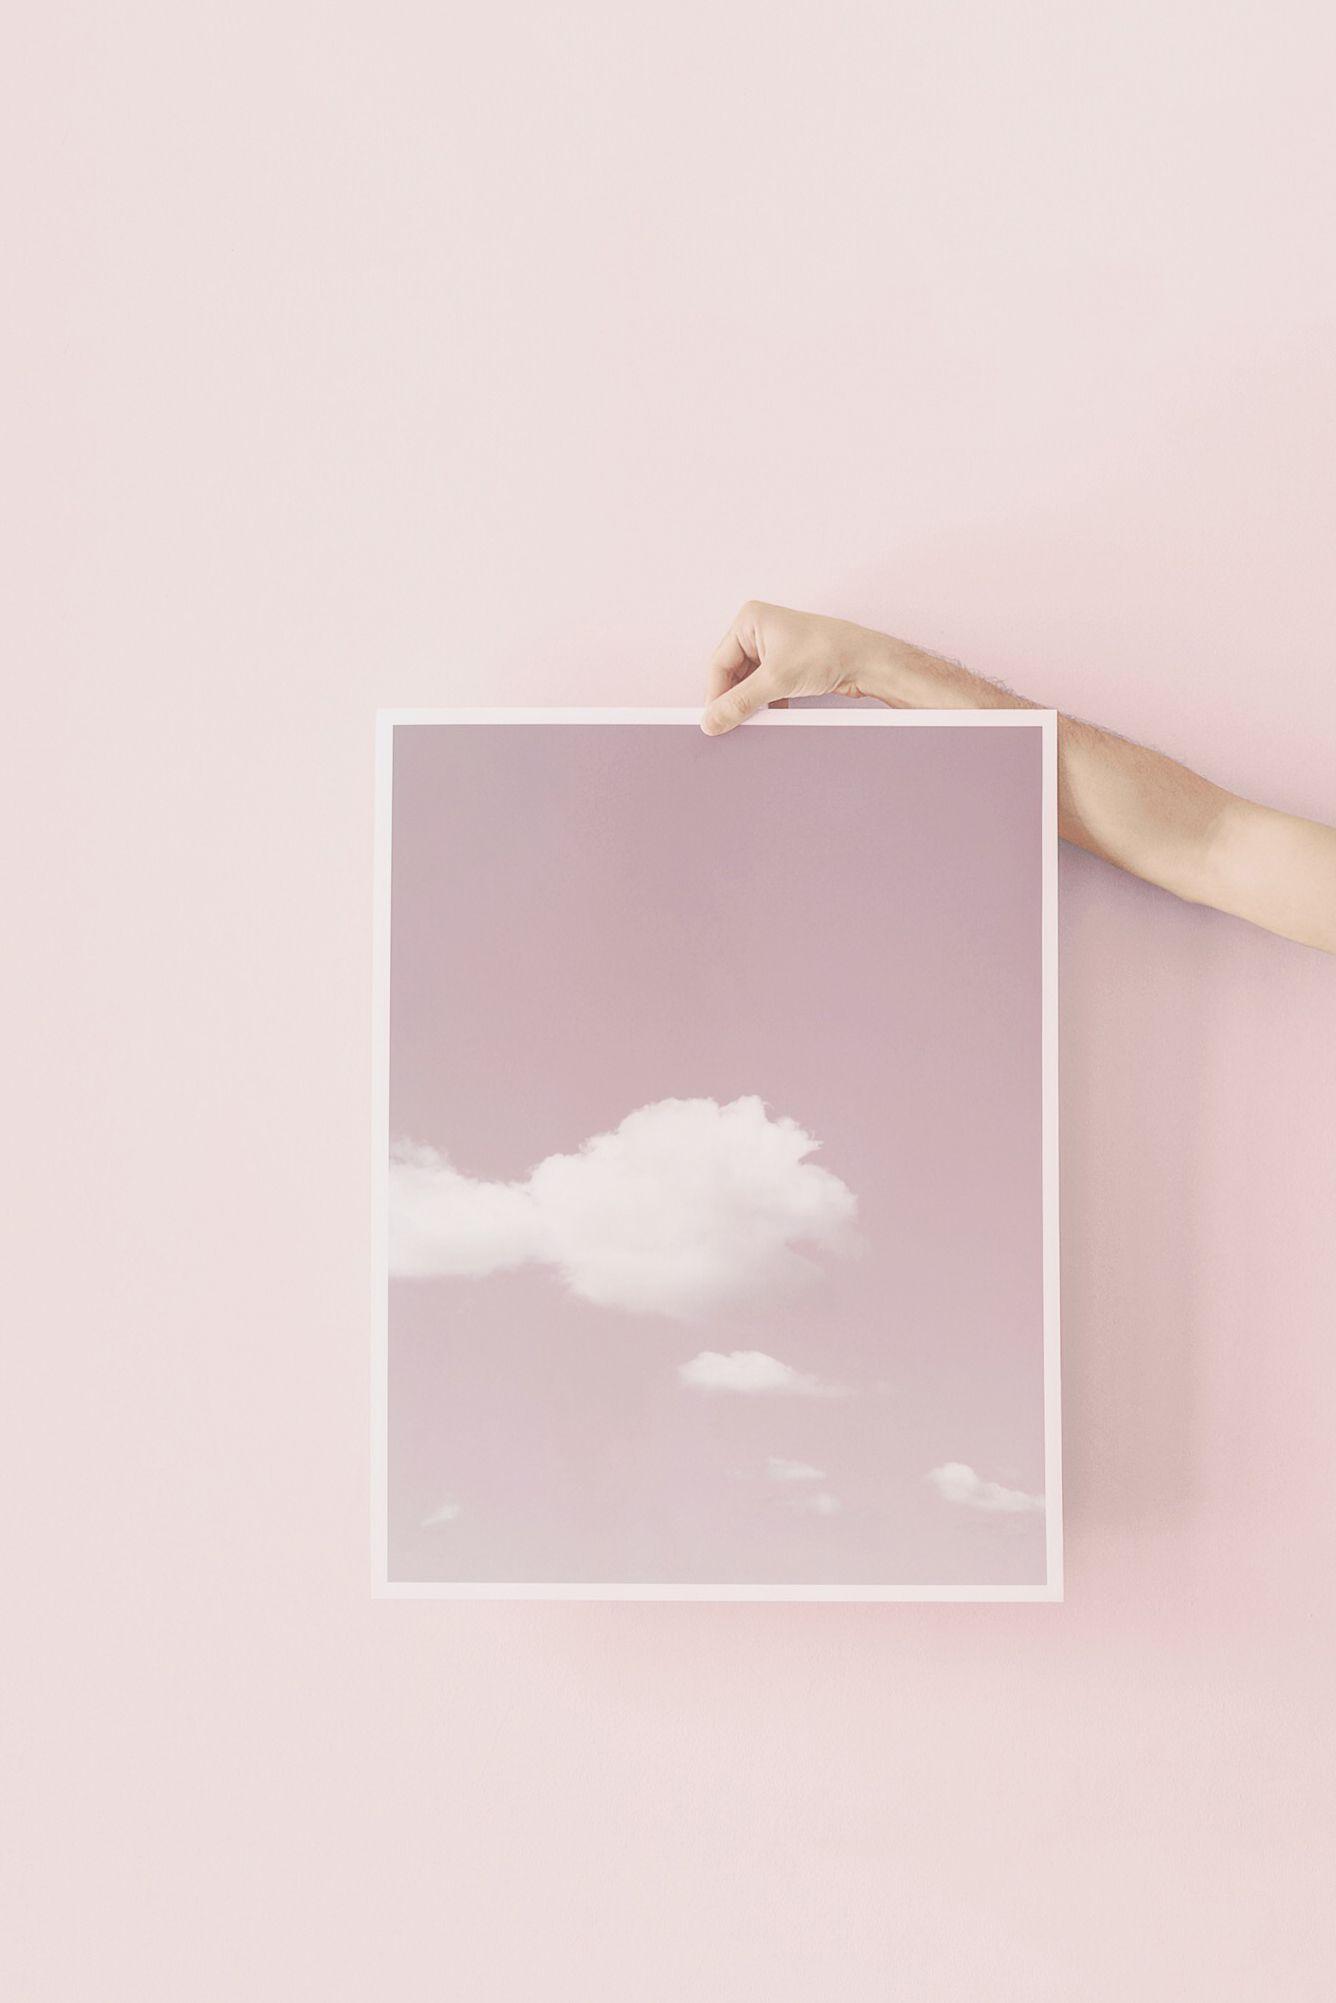 Cloud Print Cloud Wall Art Pastel Wall Art Pink Wall Art Pastel Art Print Cloud Photography Prints Wall Art Wall Art Prints Artwork Pink Wall Art Pastel Wall Art Pastel Art